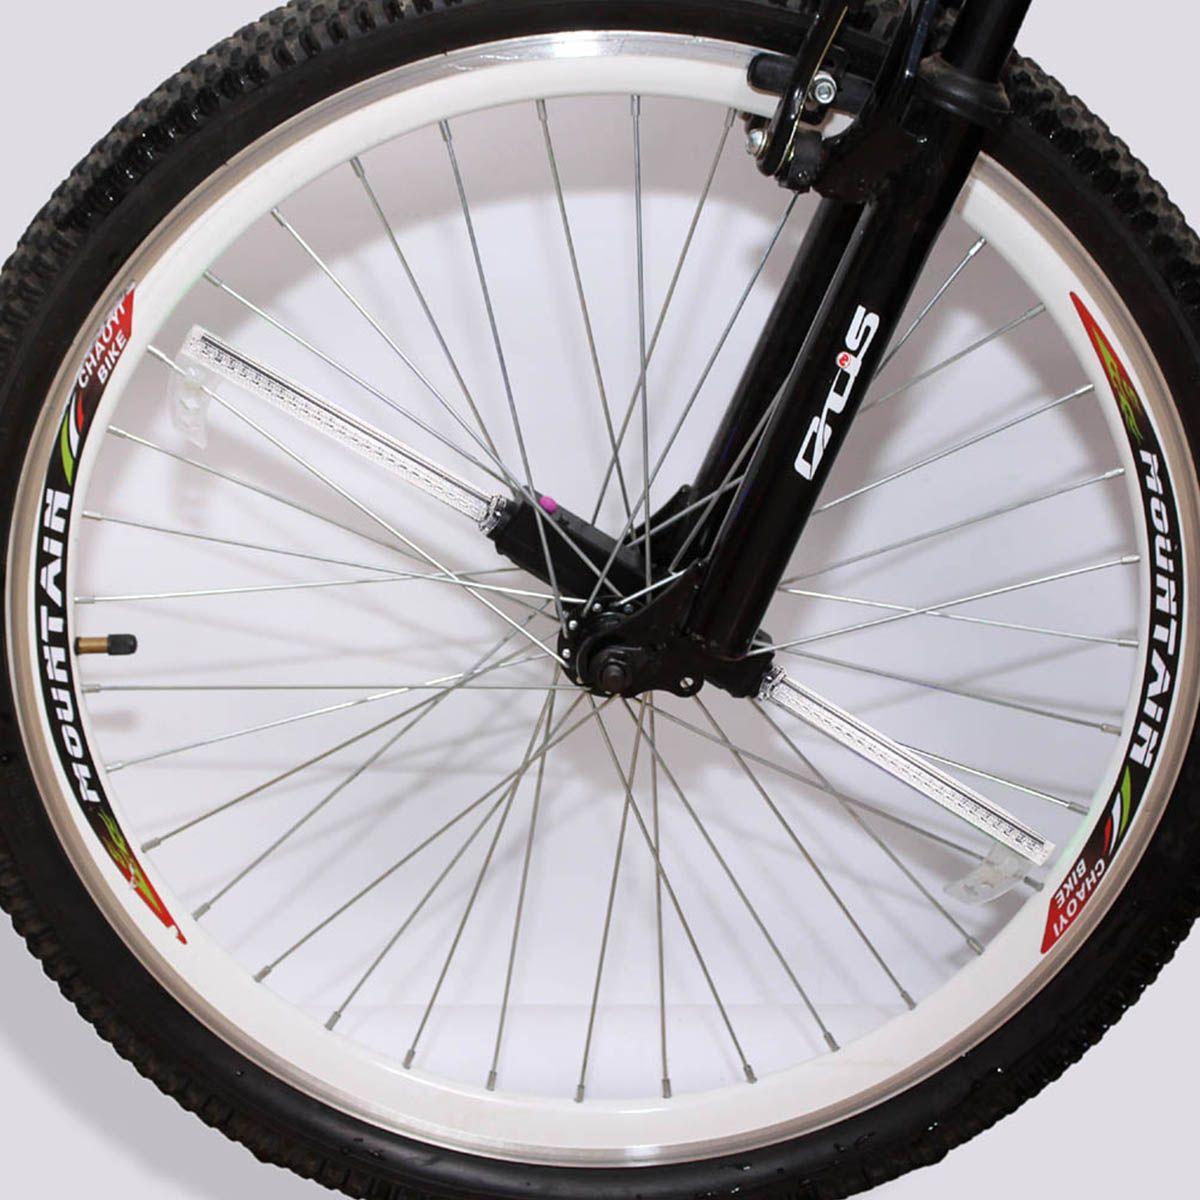 Alta calidad 36LED 32 modelos de luz de la bicicleta LED RGB impermeable de color de la bicicleta que cambia la luz de la rueda para montar en la noche luces led bicicleta